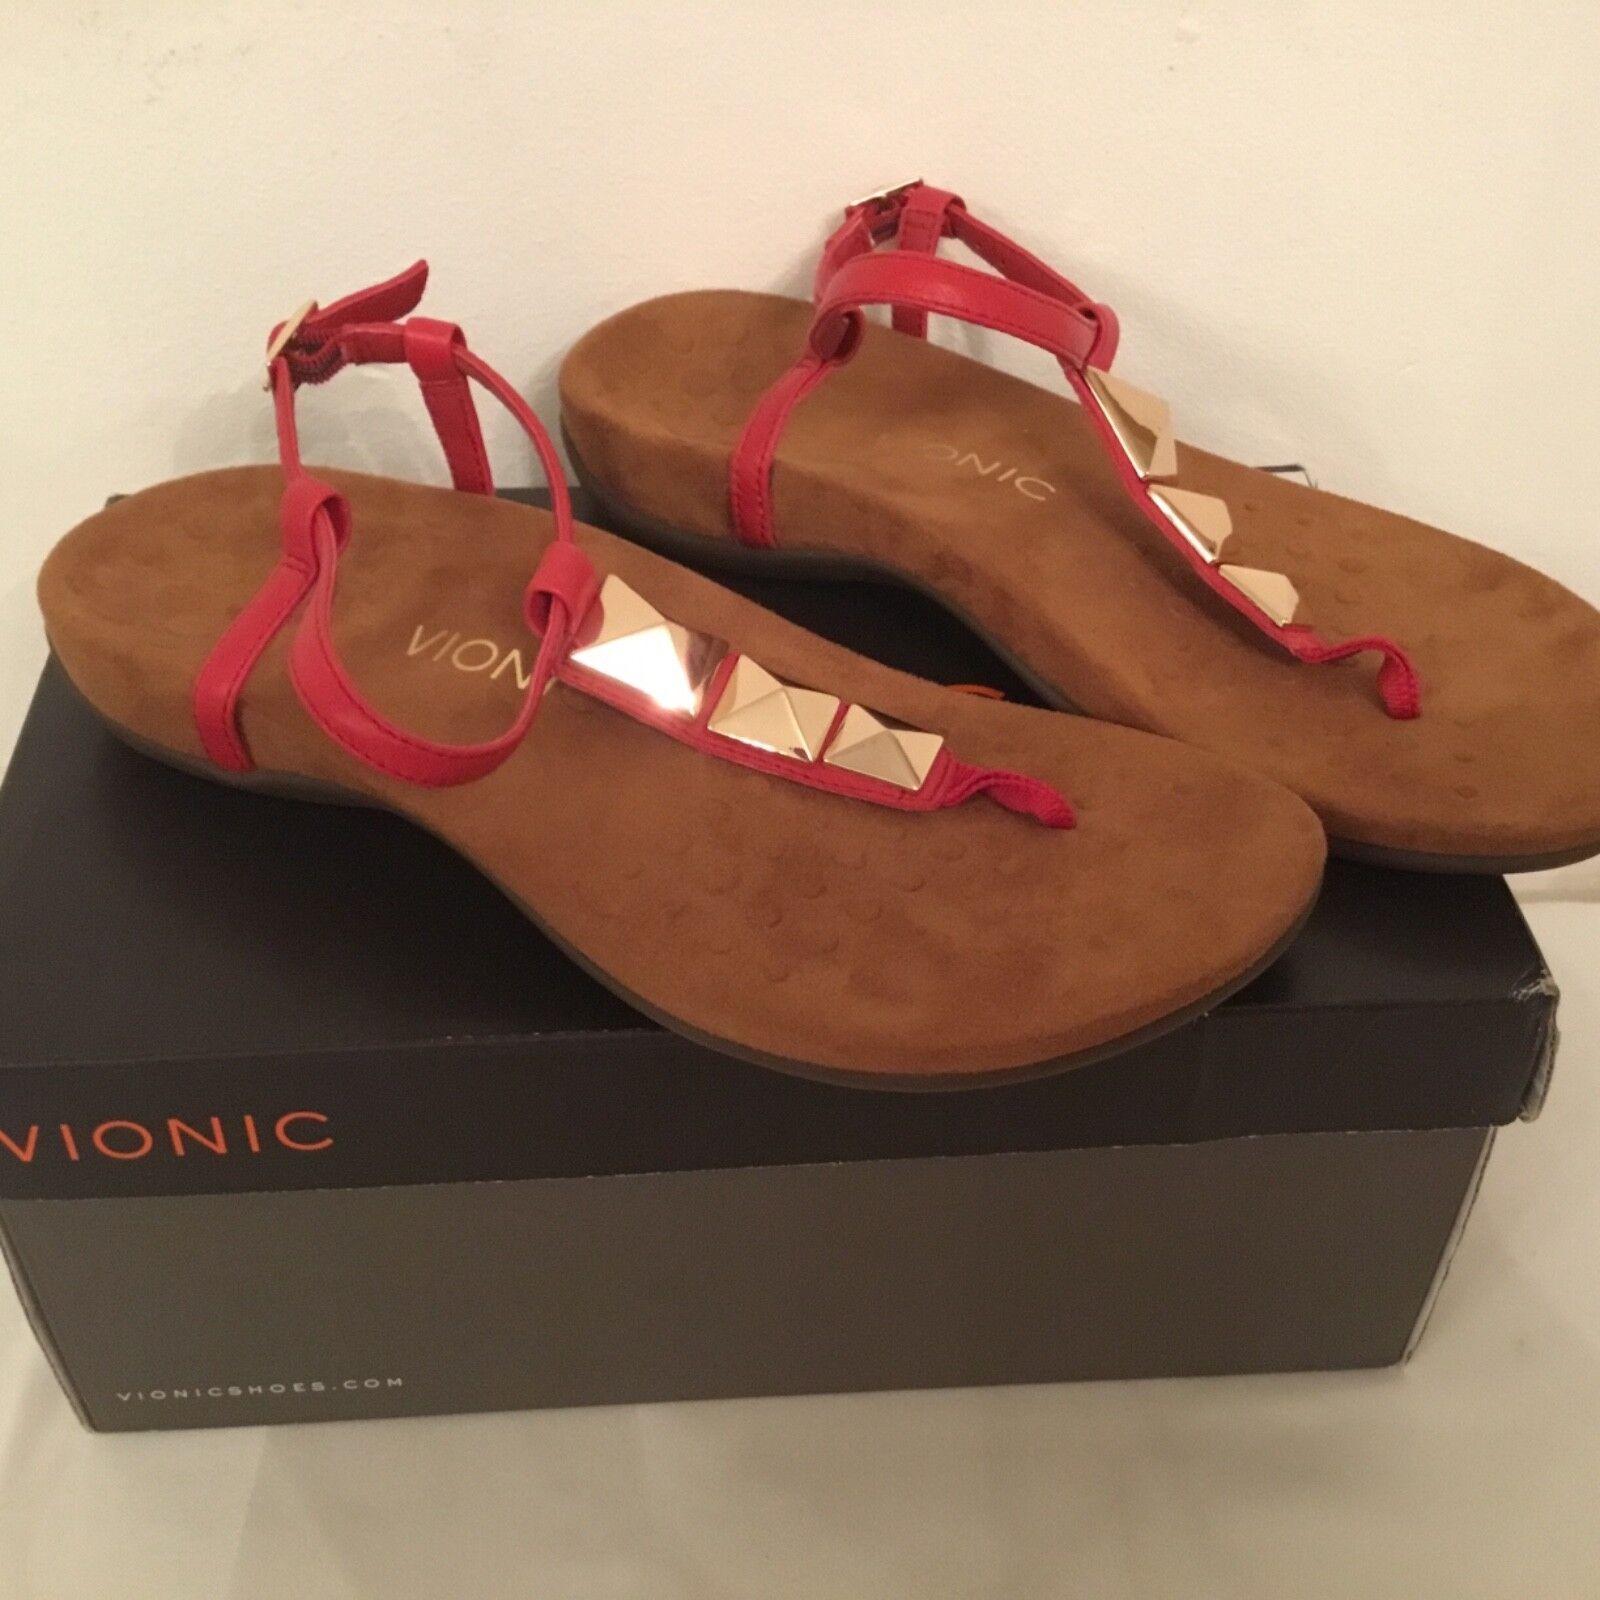 Vionic Orthotic Rest Nala Stud Detail Sandal with FMT Technology - Red-uk 7